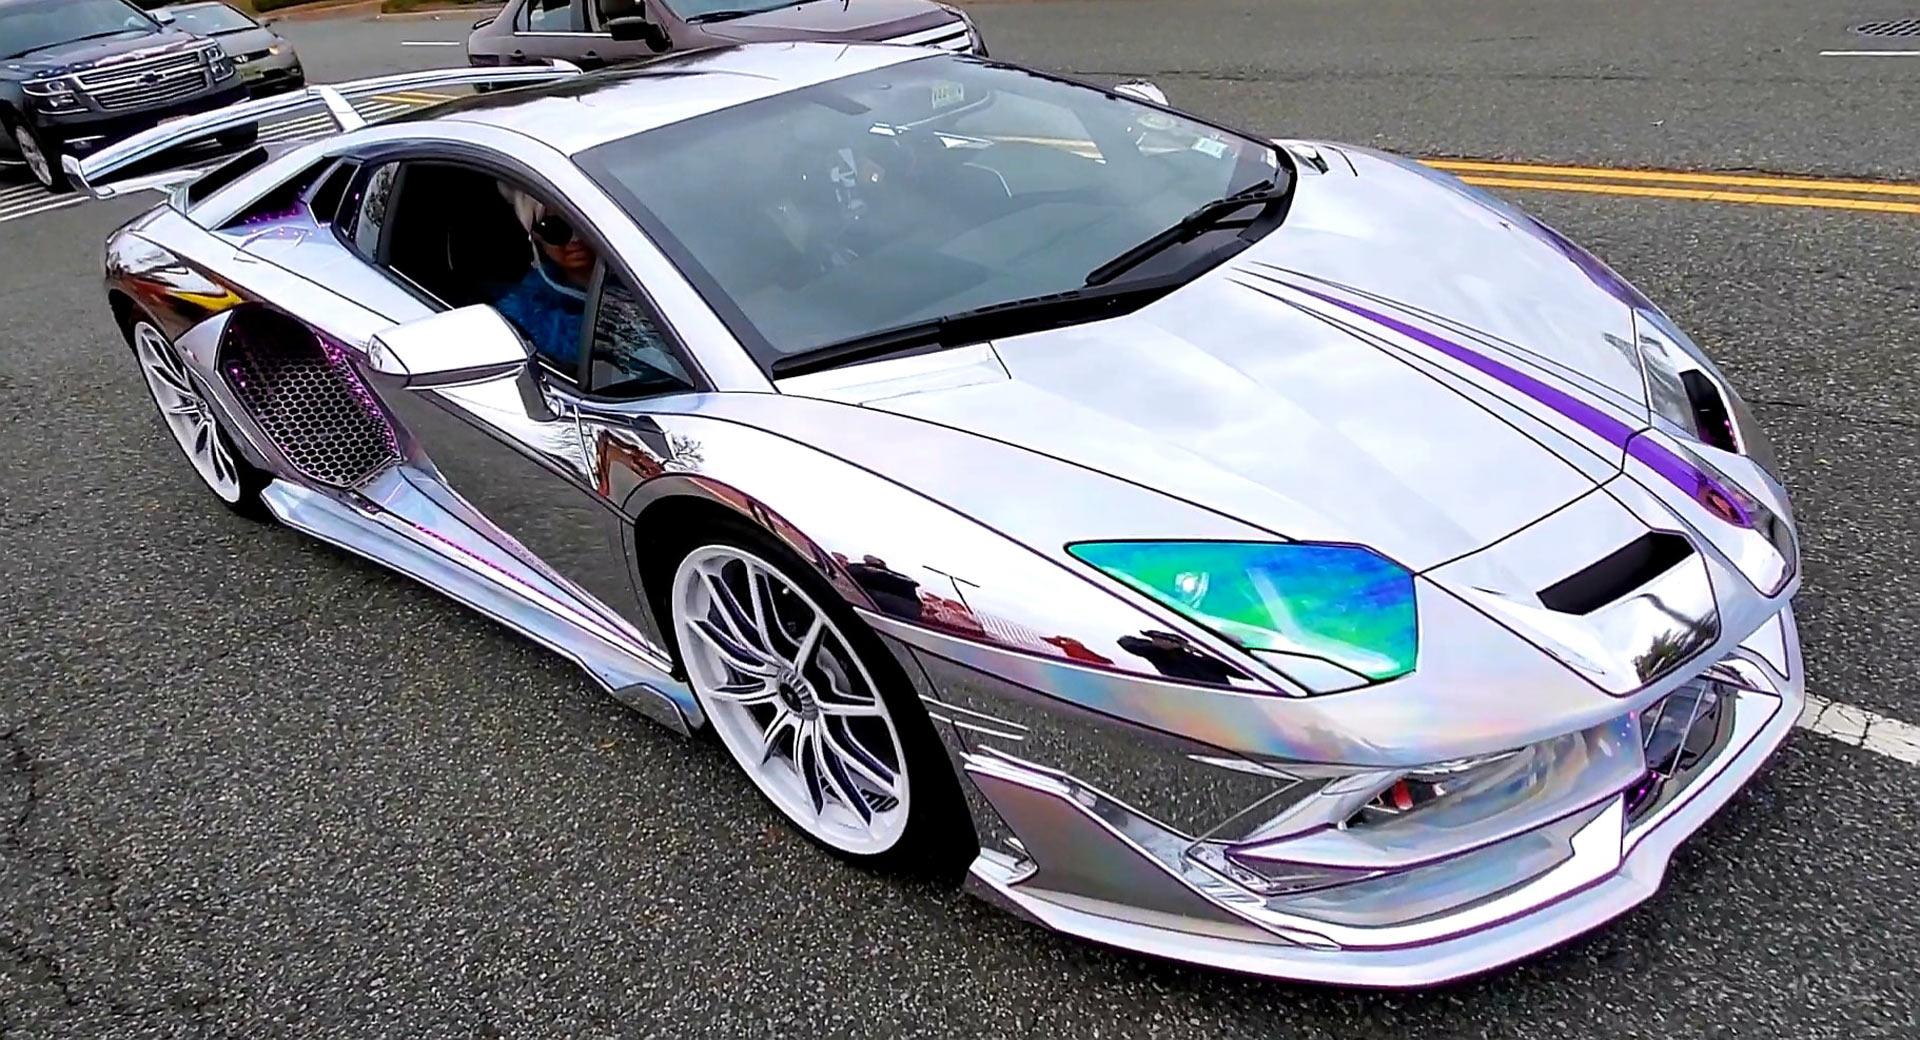 Holographic Chrome Lamborghini Aventador SVJ Is As Bright As Times Square